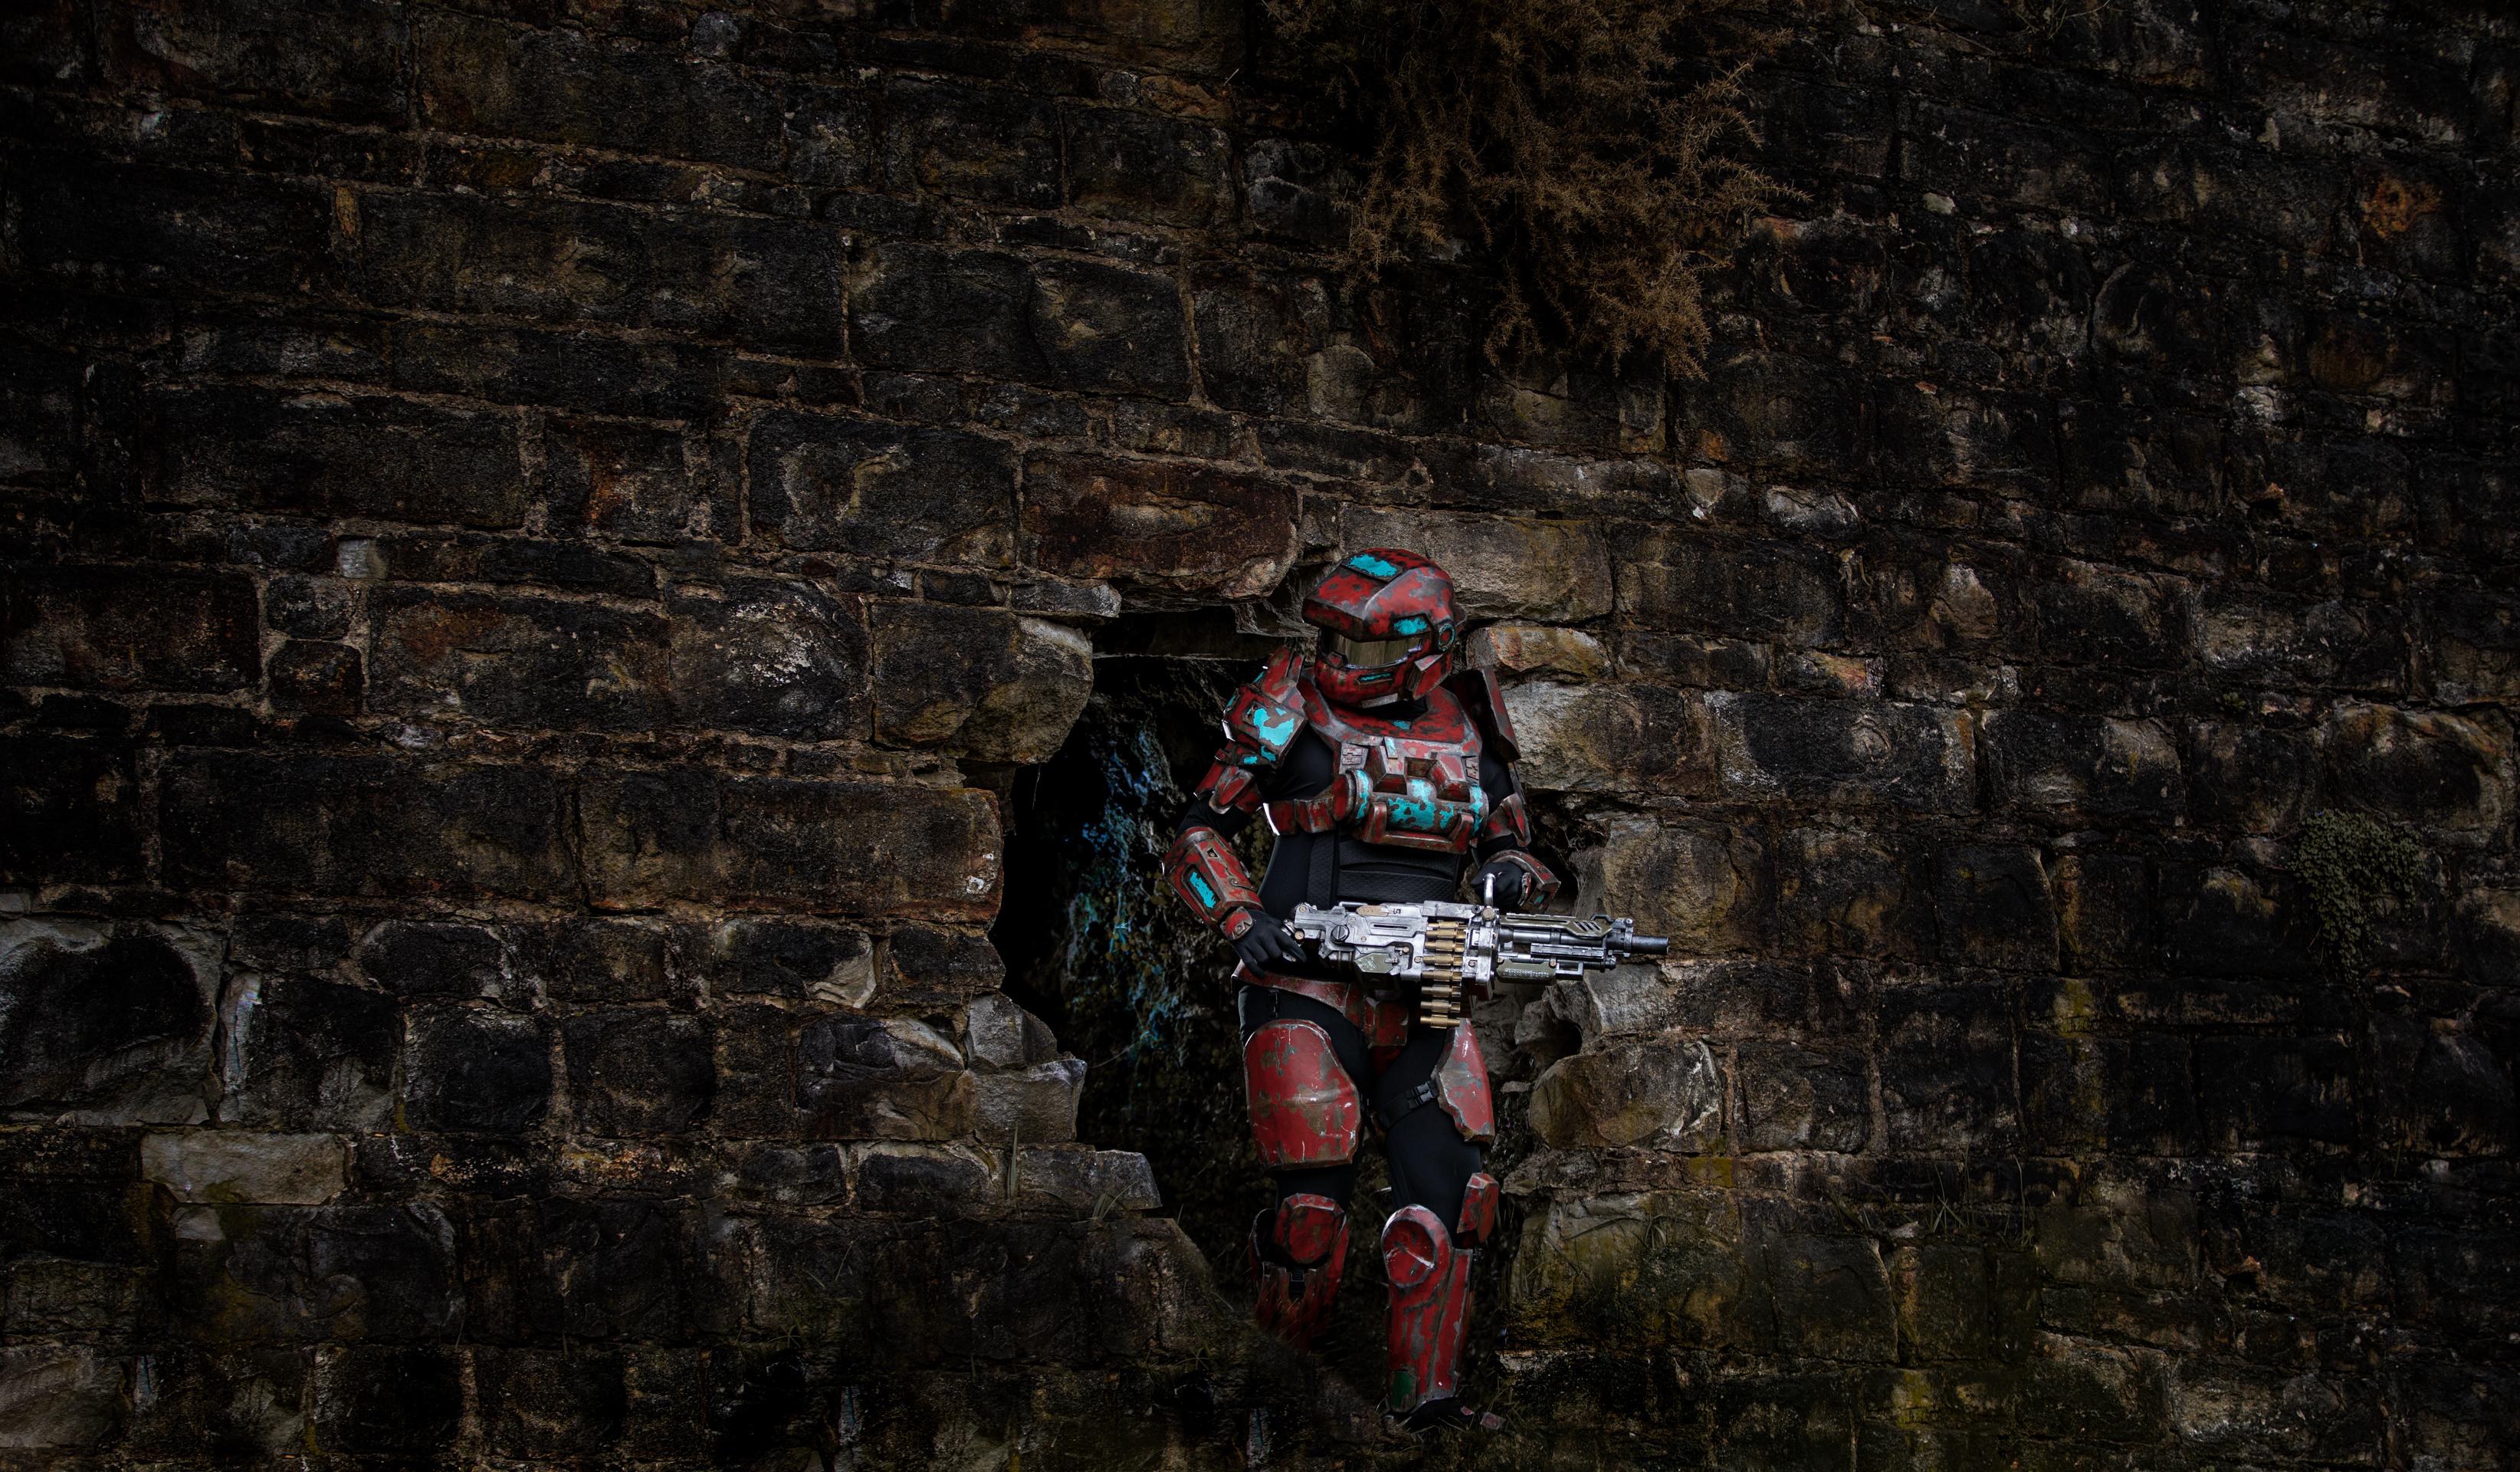 Halo soilder emerbges from a cave Waihi